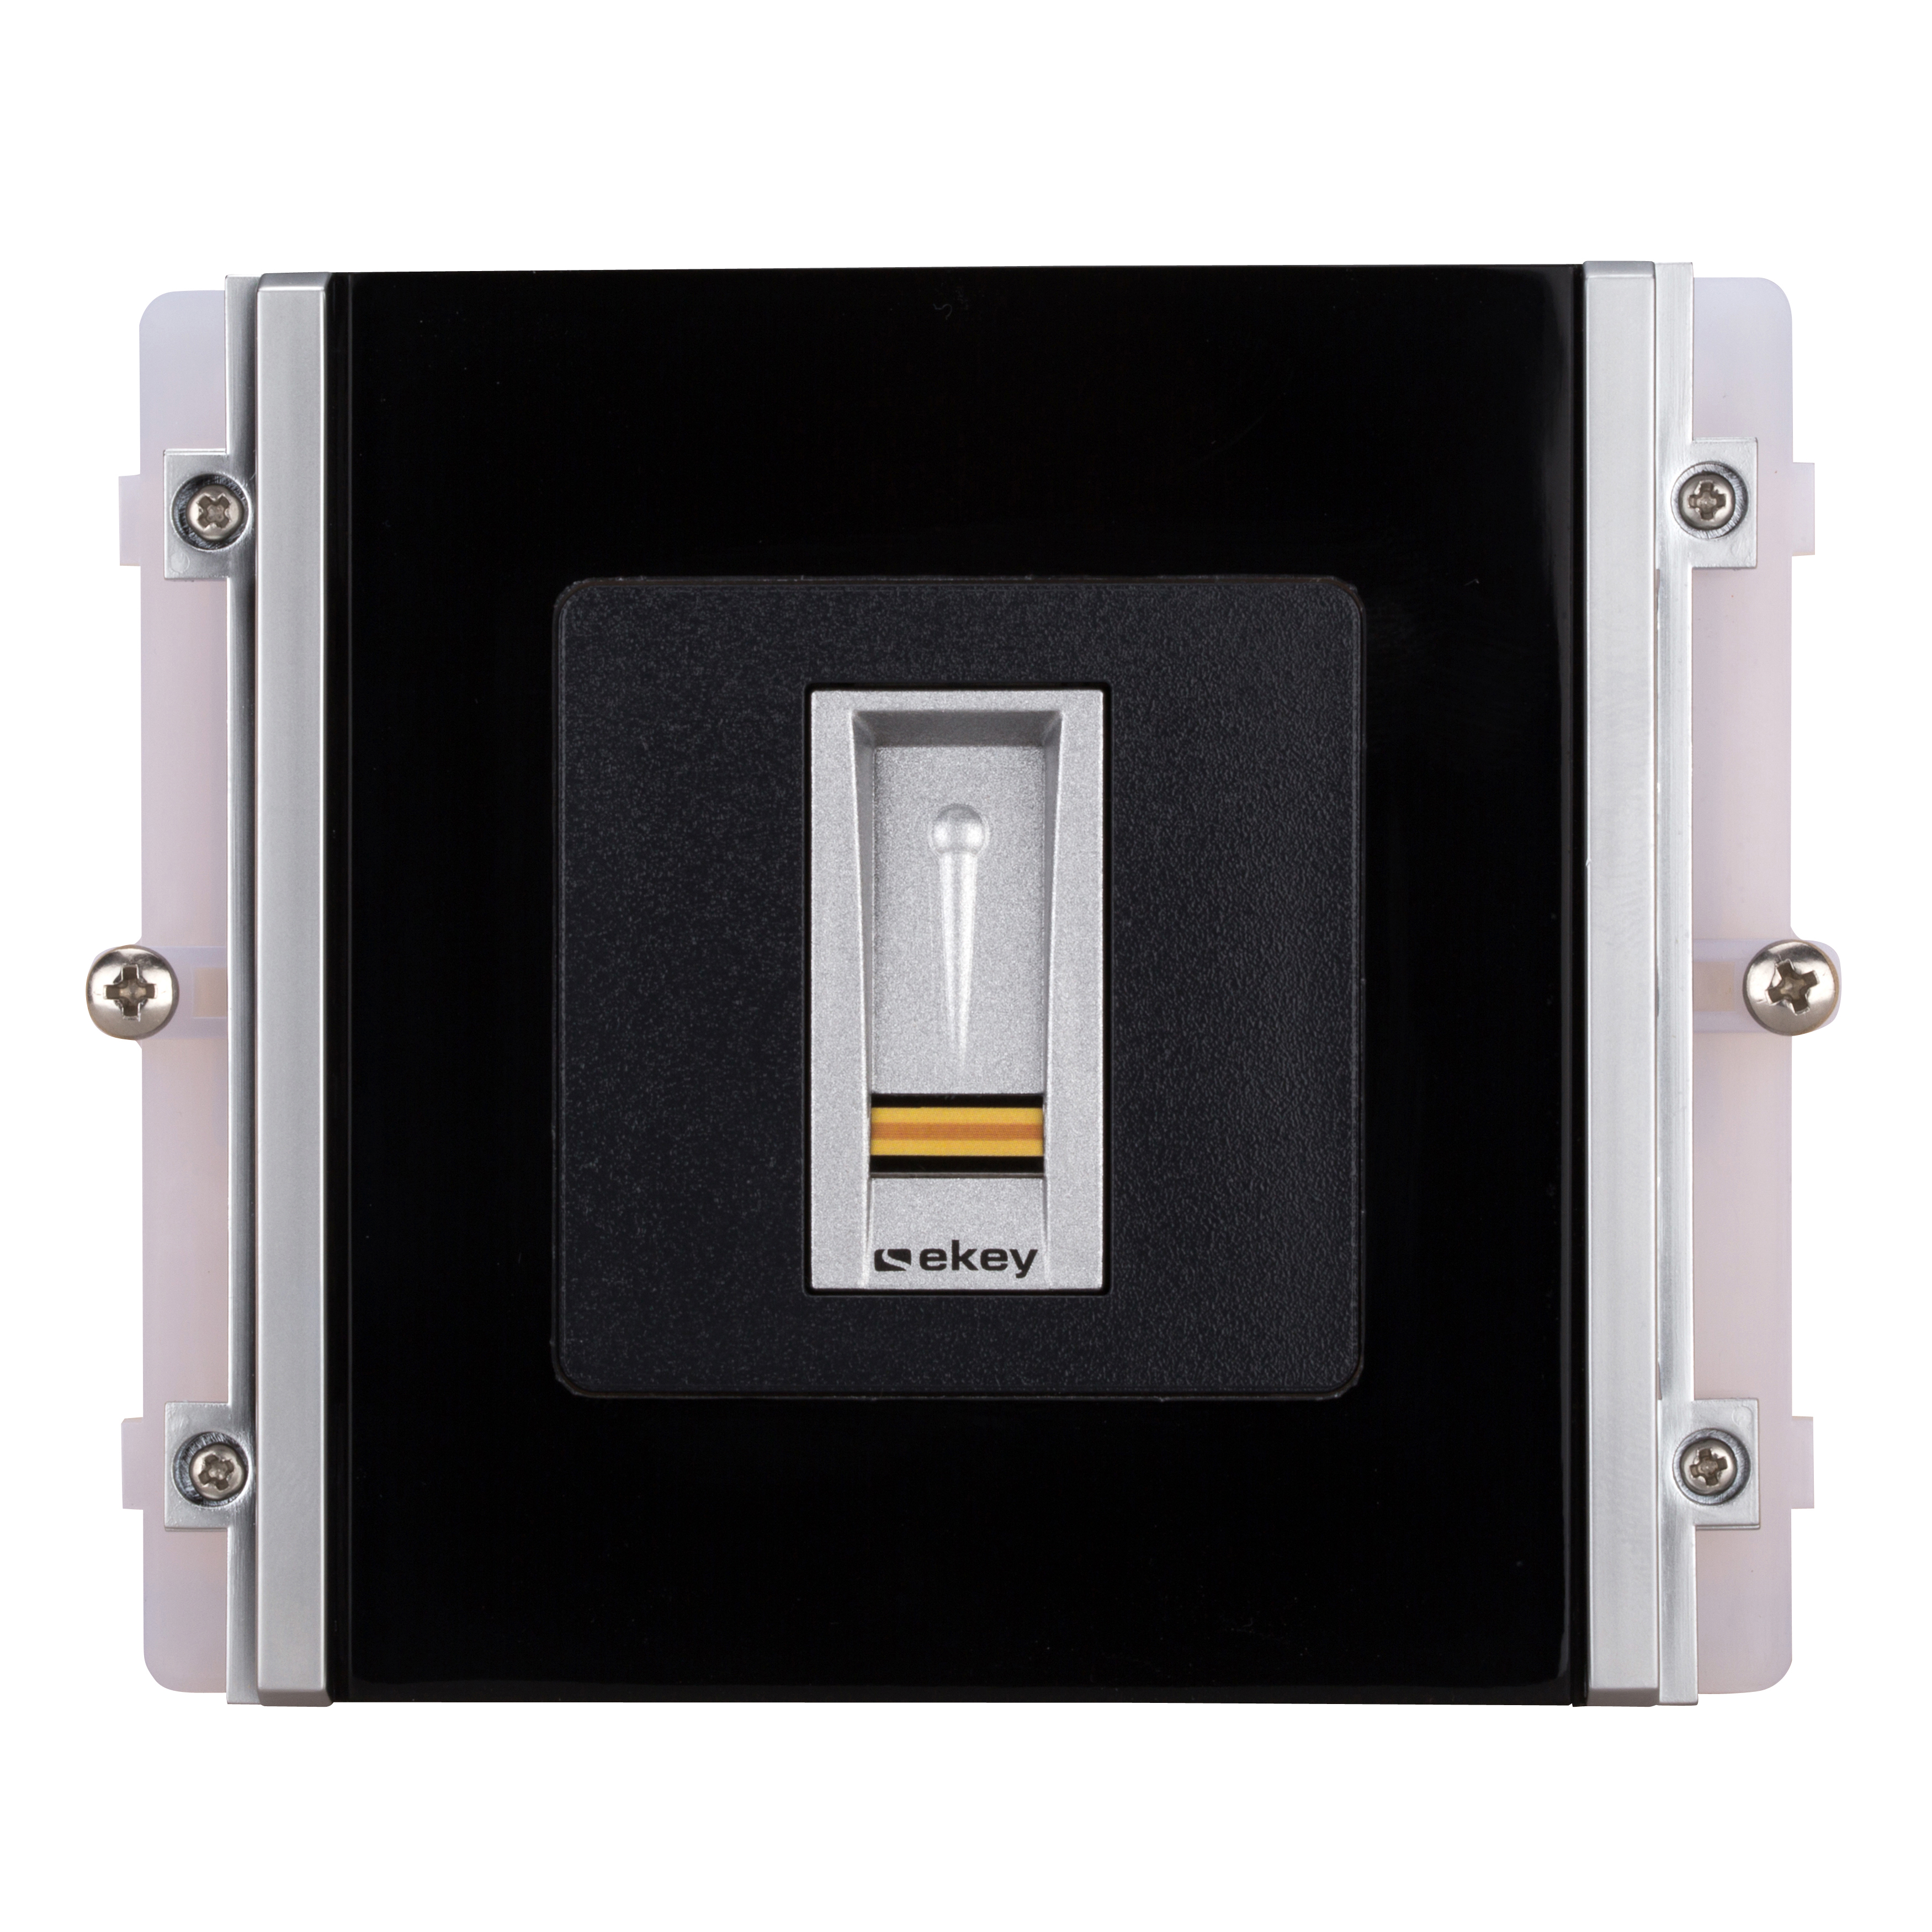 1 Stk EKEY Fingerscanner-Modul für IKALL, schwarz SP3334S-EK